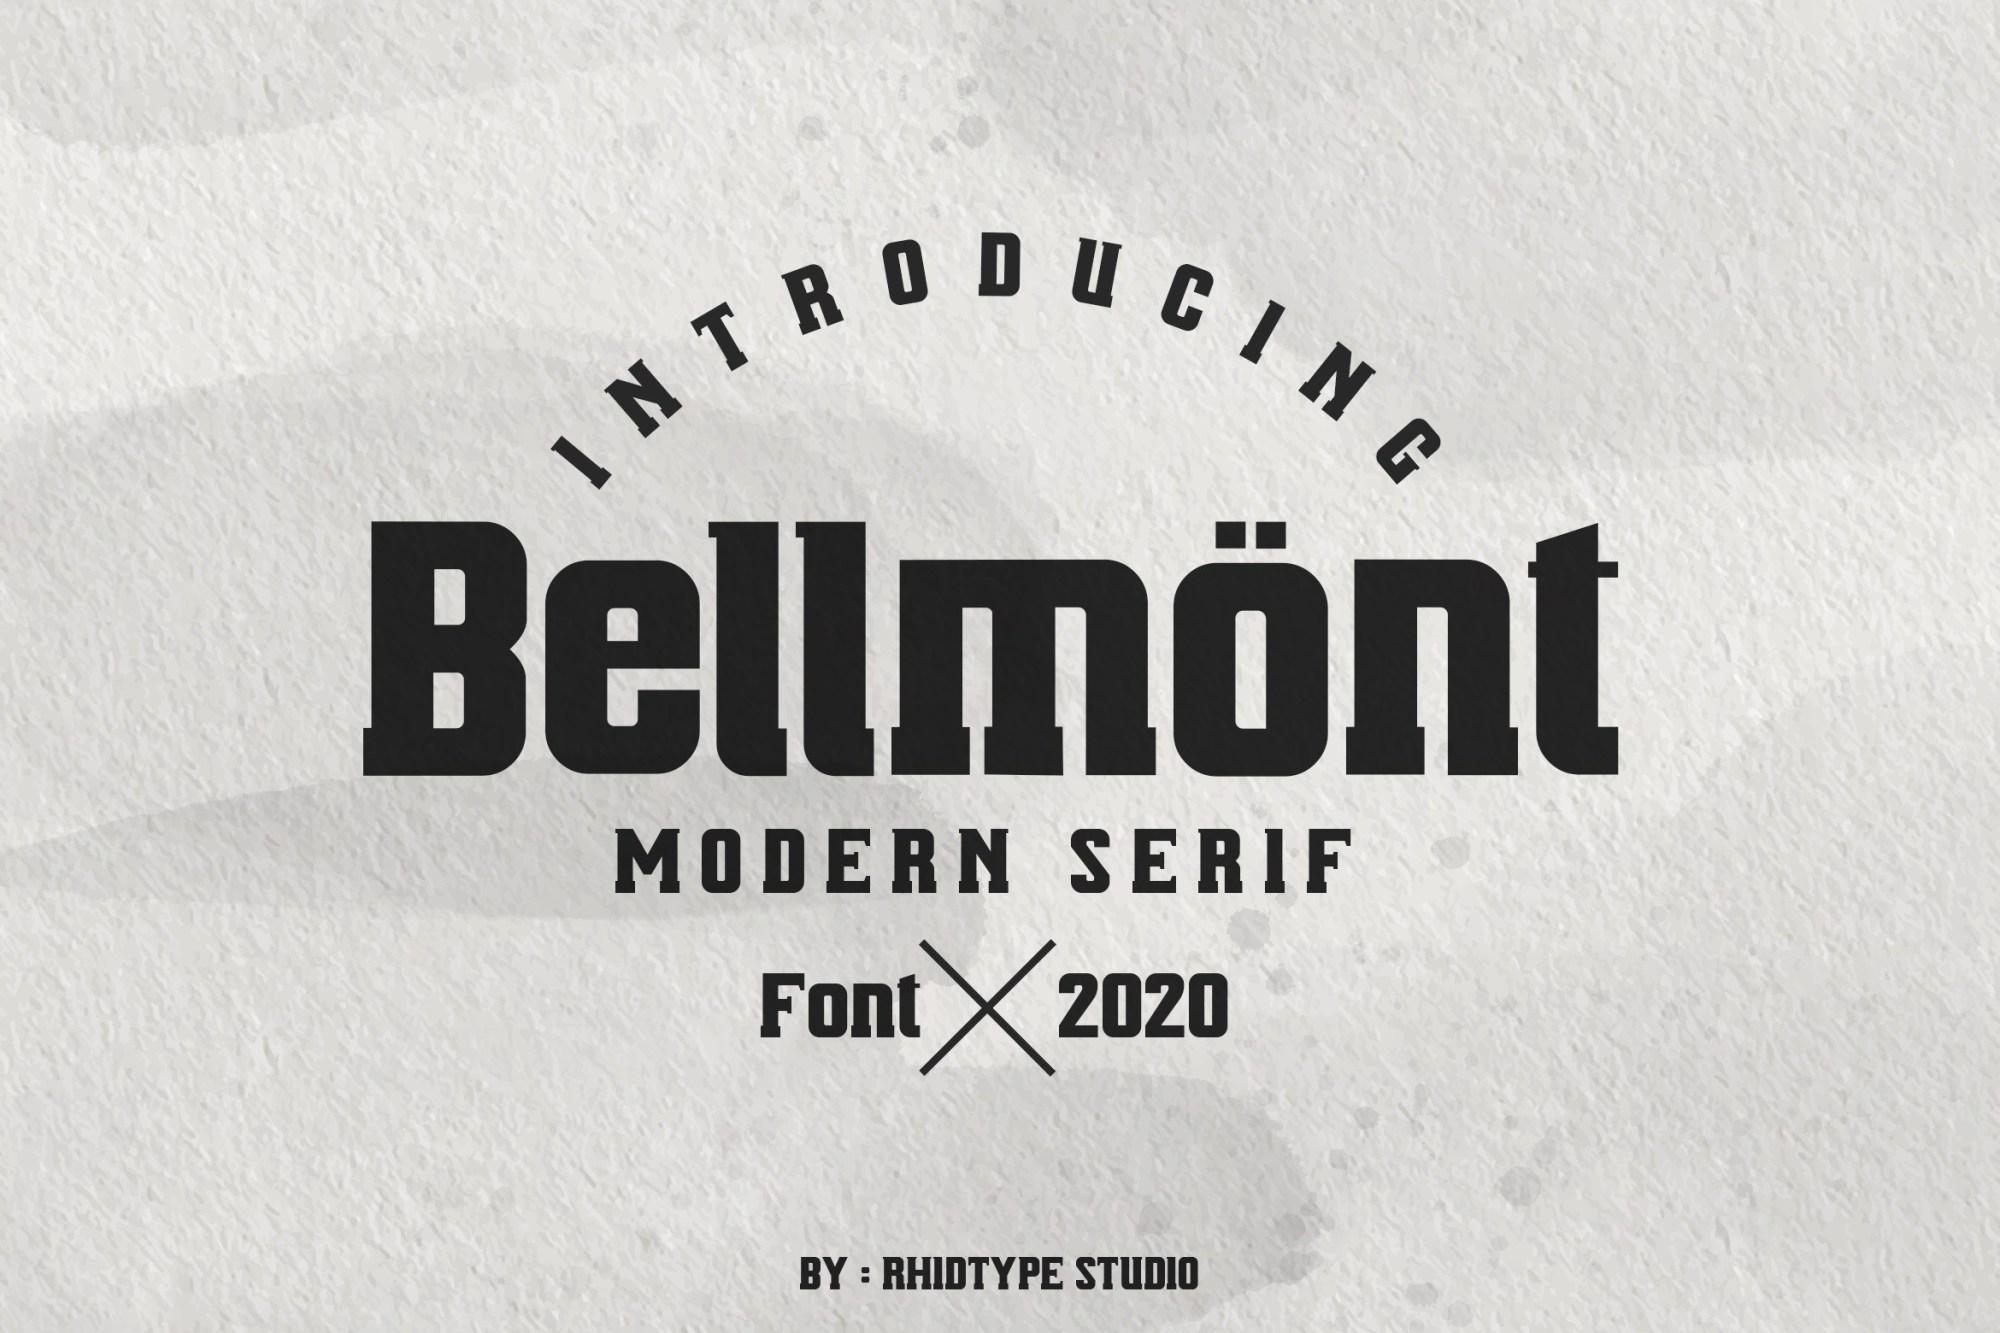 Bellmont-Modern-Serif-Typeface